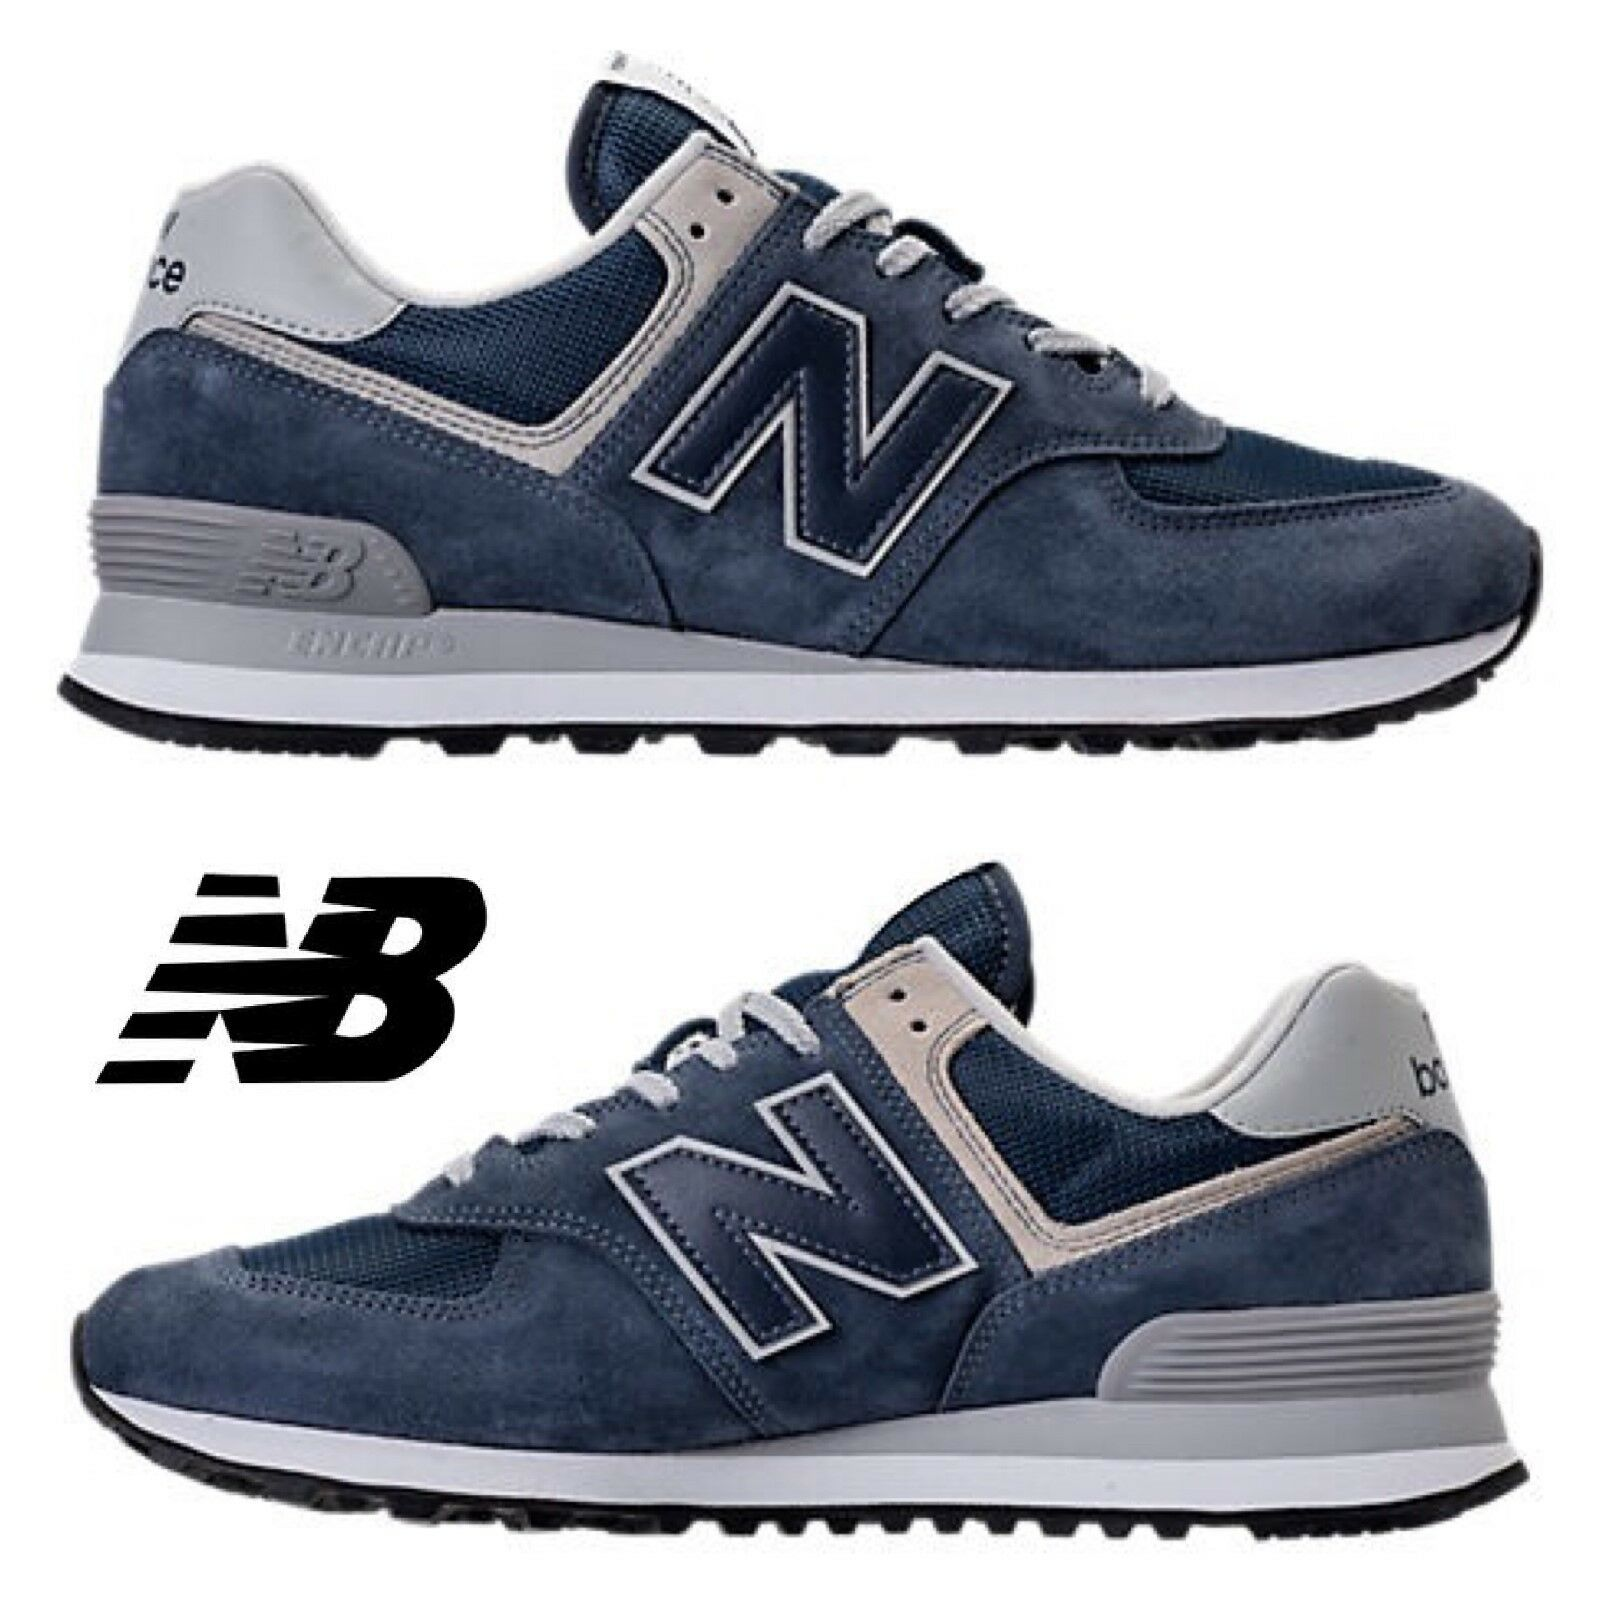 New Balance 574 Men's Sneakers Casual Shoes Running Premium Comfort Sport NIB